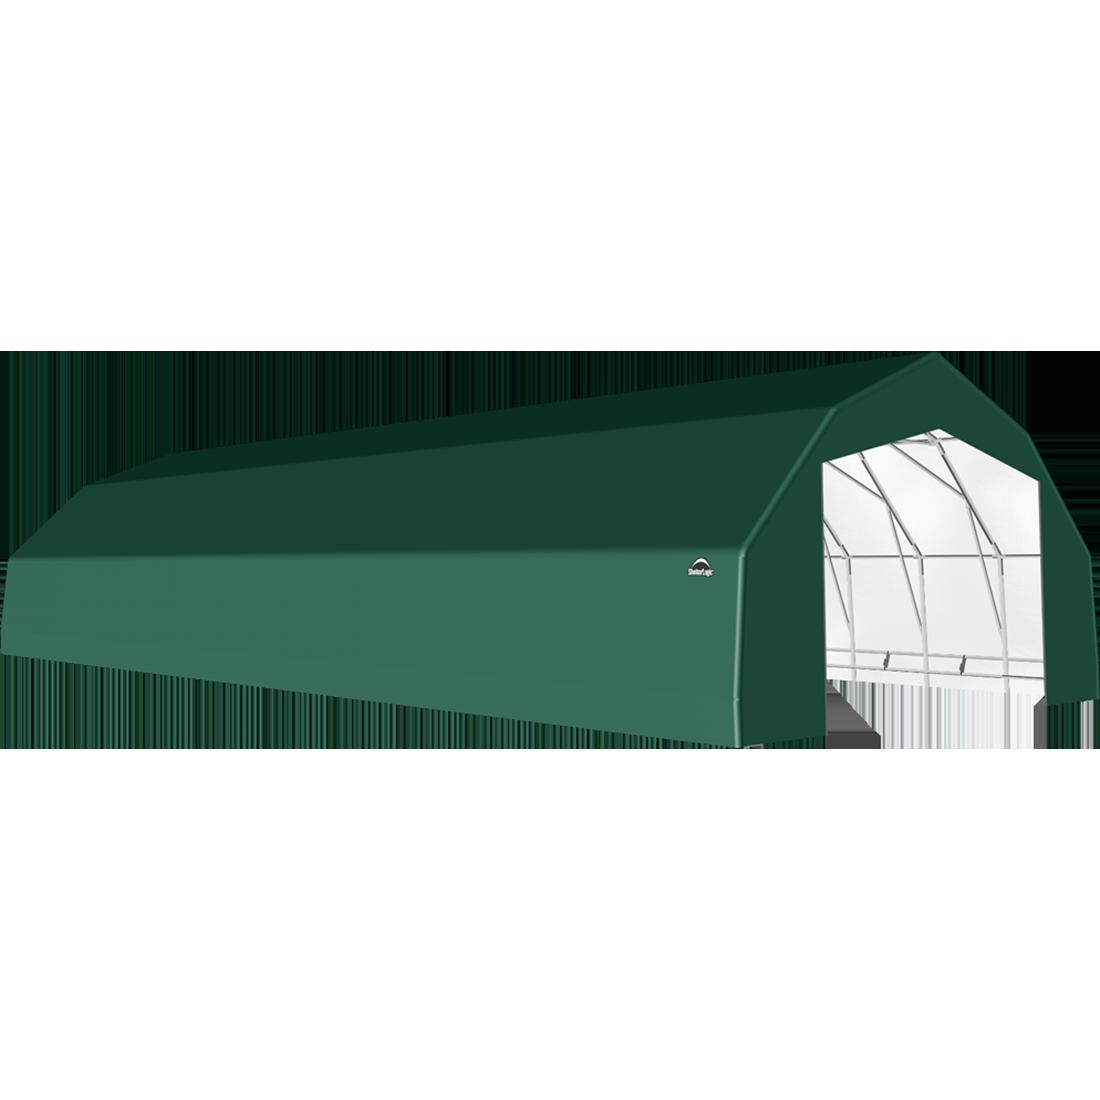 ShelterTech SP Series Barn Shelter, 25 ft. x 68 ft. x 14 ft. Heavy Duty PVC 14.5 oz. Green